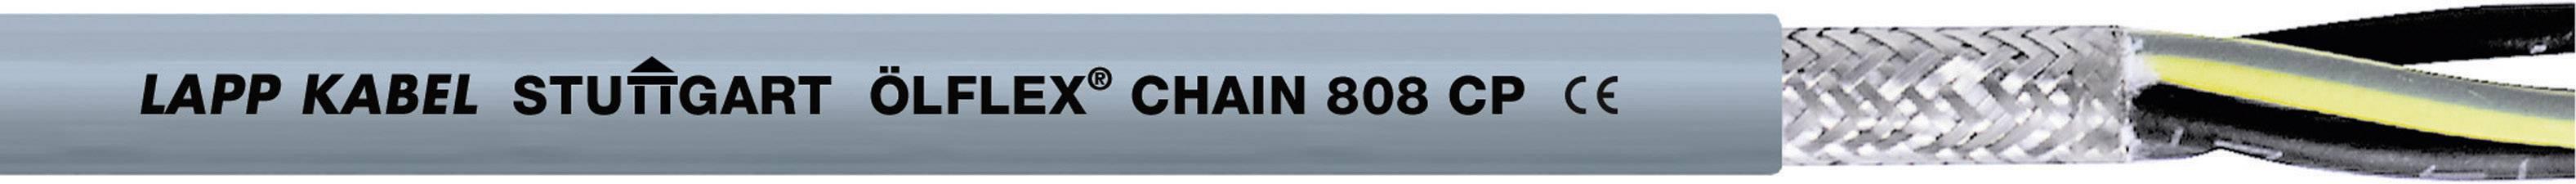 Žíla kabelu LappKabel ÖLFLEX CHAIN 808 CP 4G0,5 (1027753), 4x 0,5 mm², polyurethan, Ø 6,6 mm, stíněný, 50 m, š